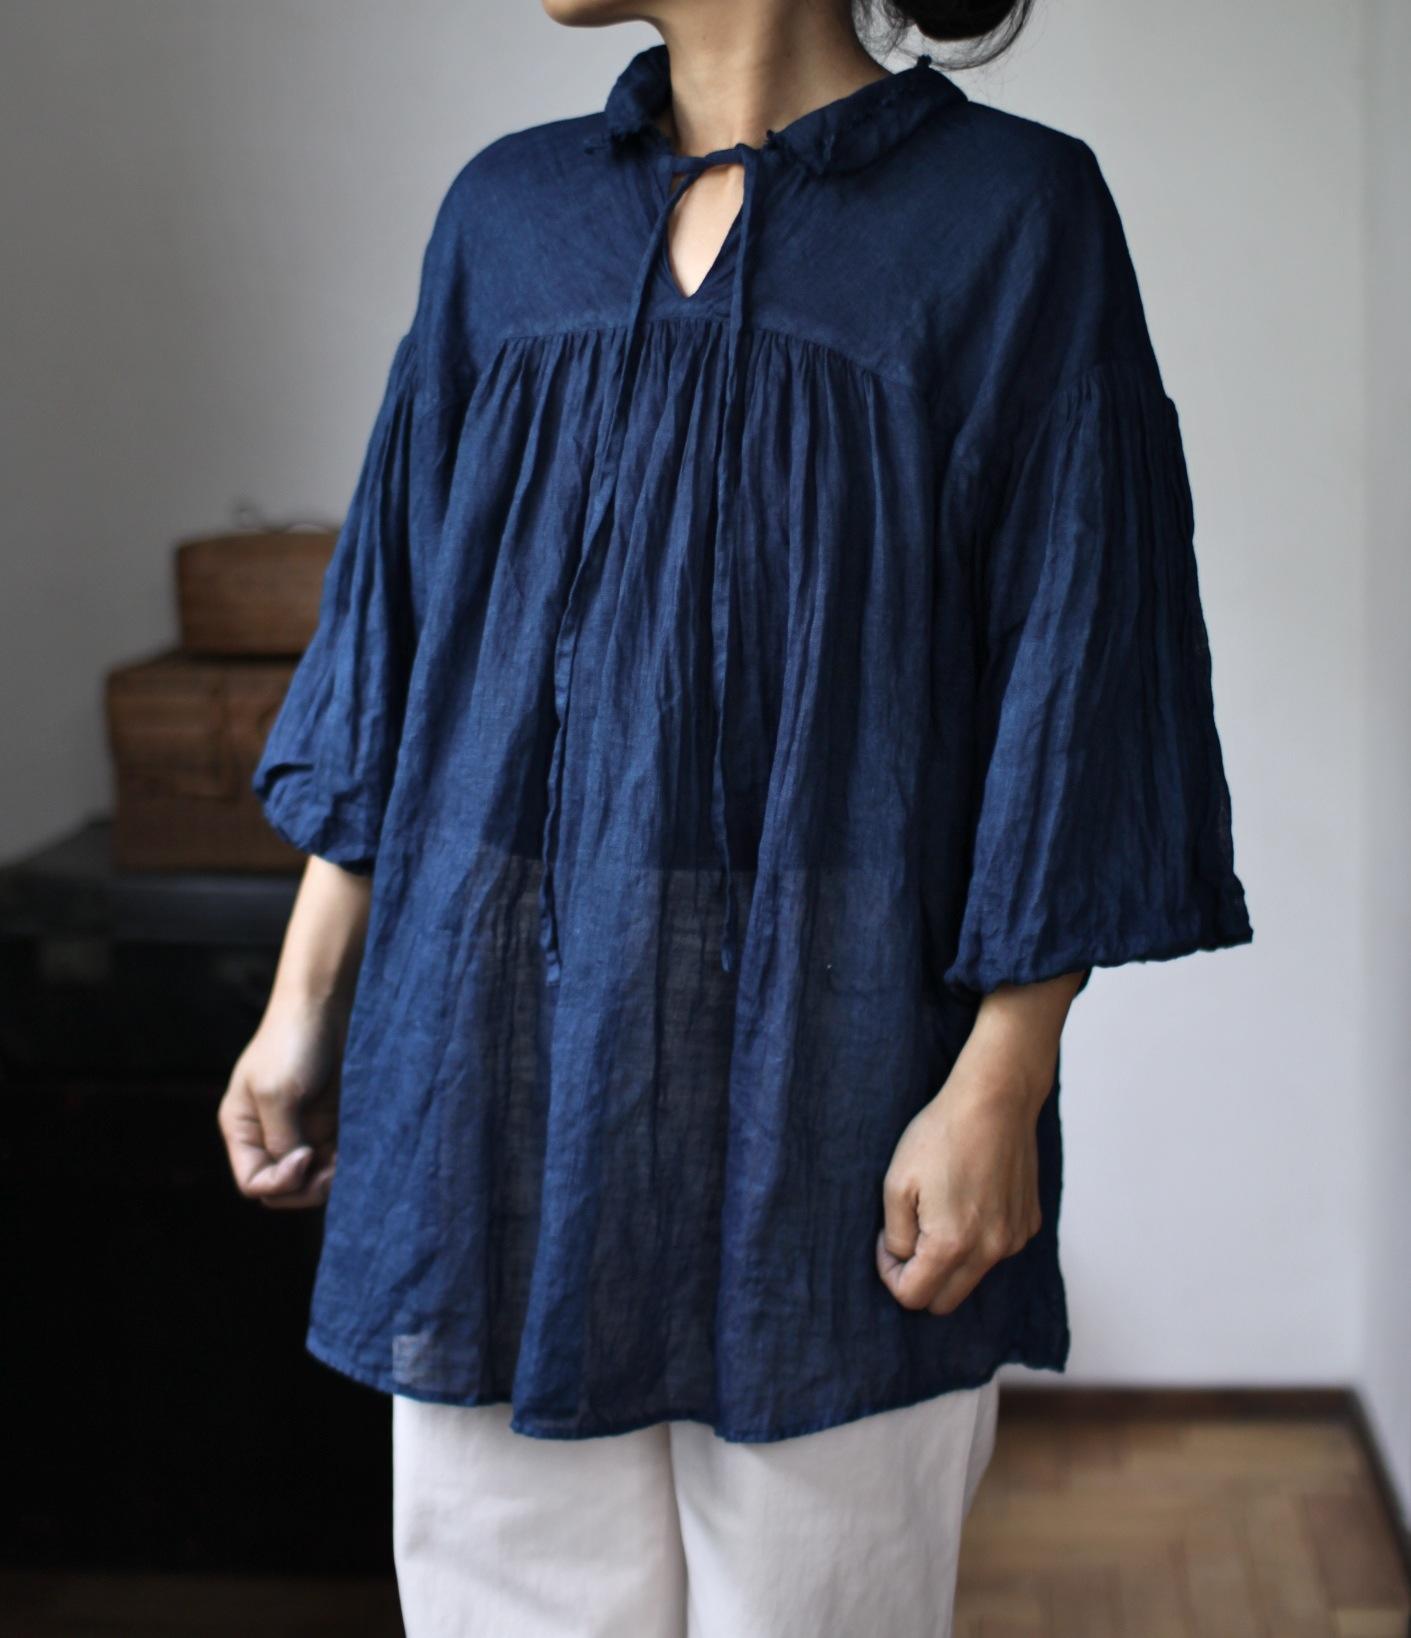 2015 Spring/Summer リネンシングルガーゼのブラウス Linen gauze blouse(B-1531)藍